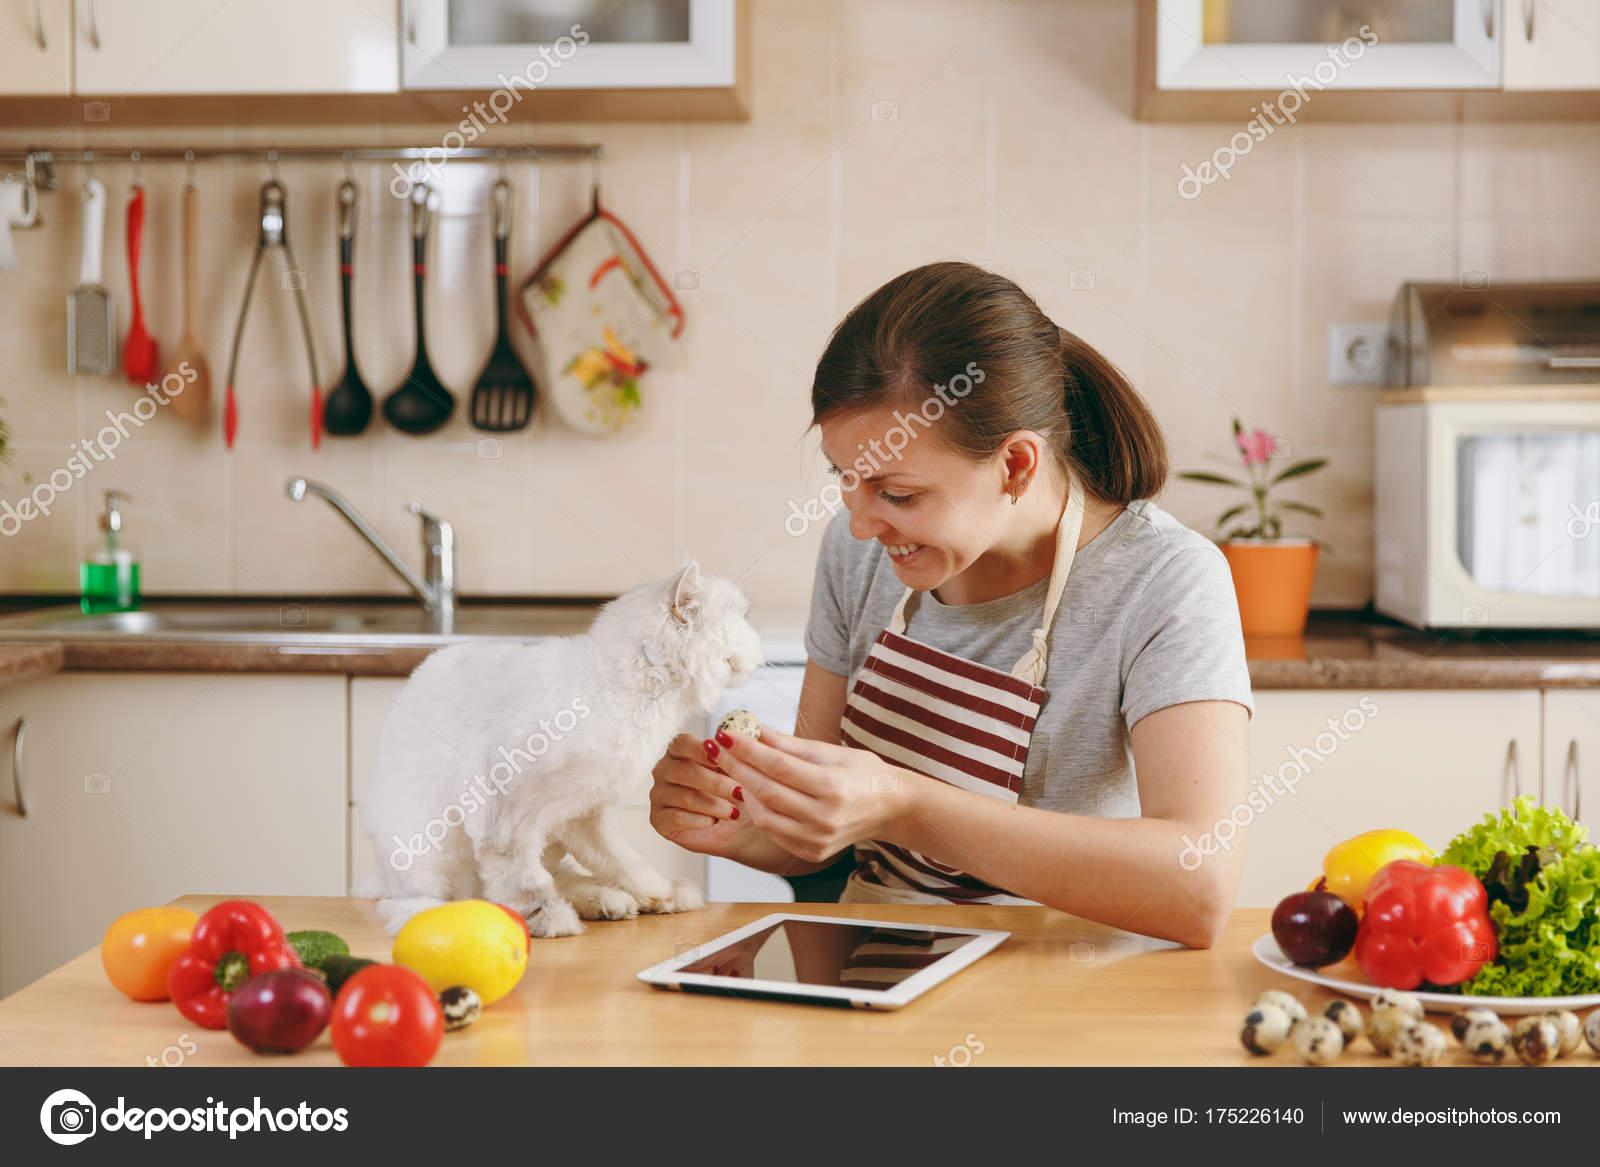 nice kitchen tables mosaic tile 一个年轻漂亮的女人与白色的波斯猫在厨房与片剂在桌子上 蔬菜沙拉 节食 那个年轻漂亮的女人带着白色的波斯猫在厨房里 桌子上放着平板电脑 节食概念 健康的生活方式 在家做饭